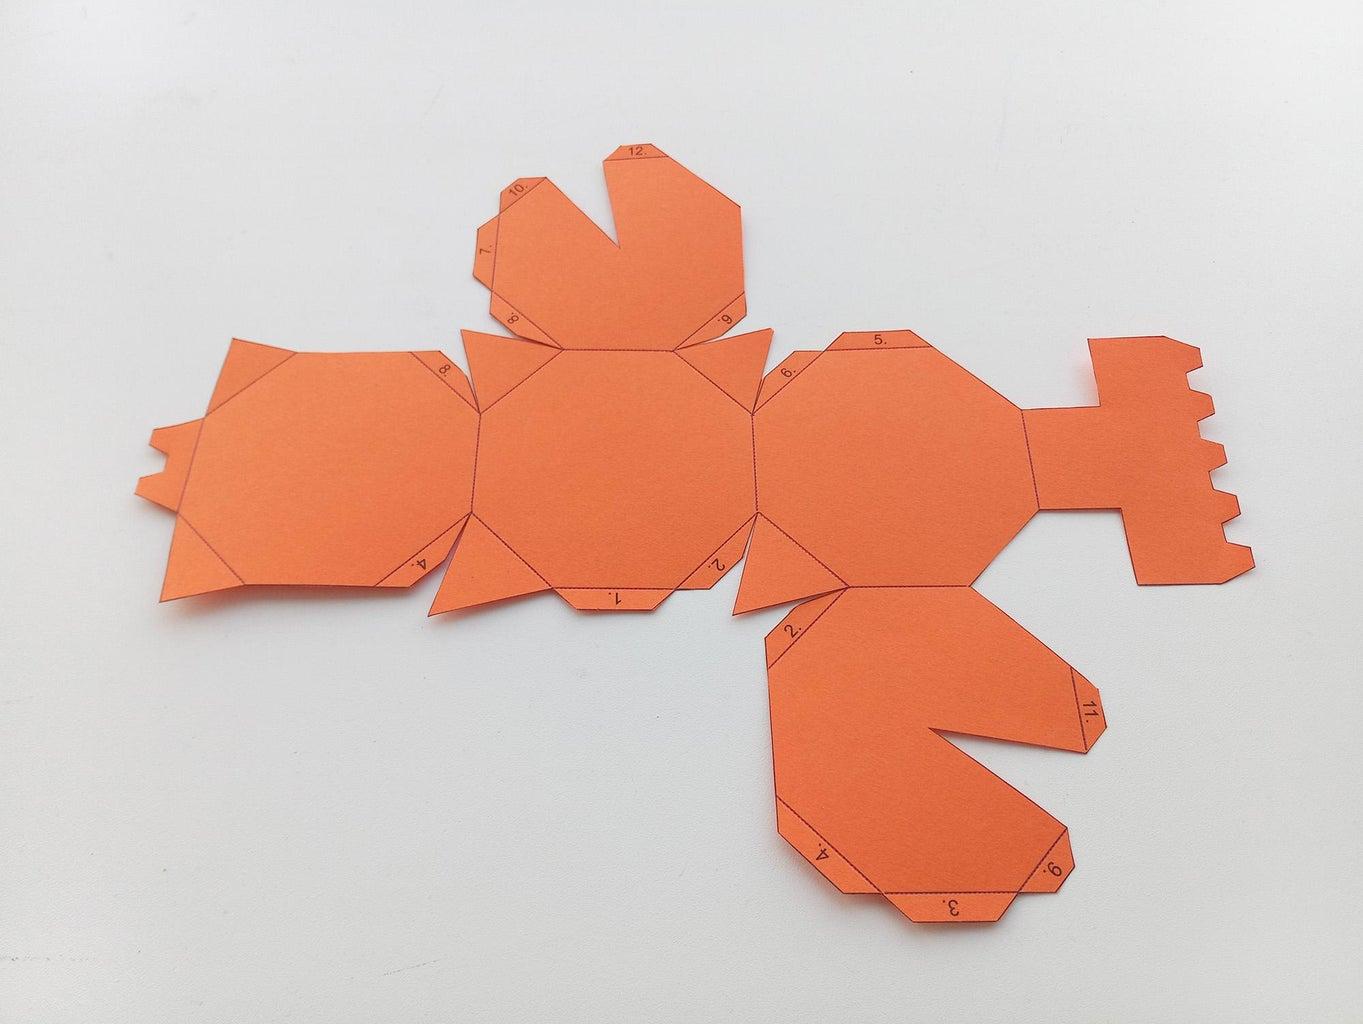 Assembling the Truncated Cube.